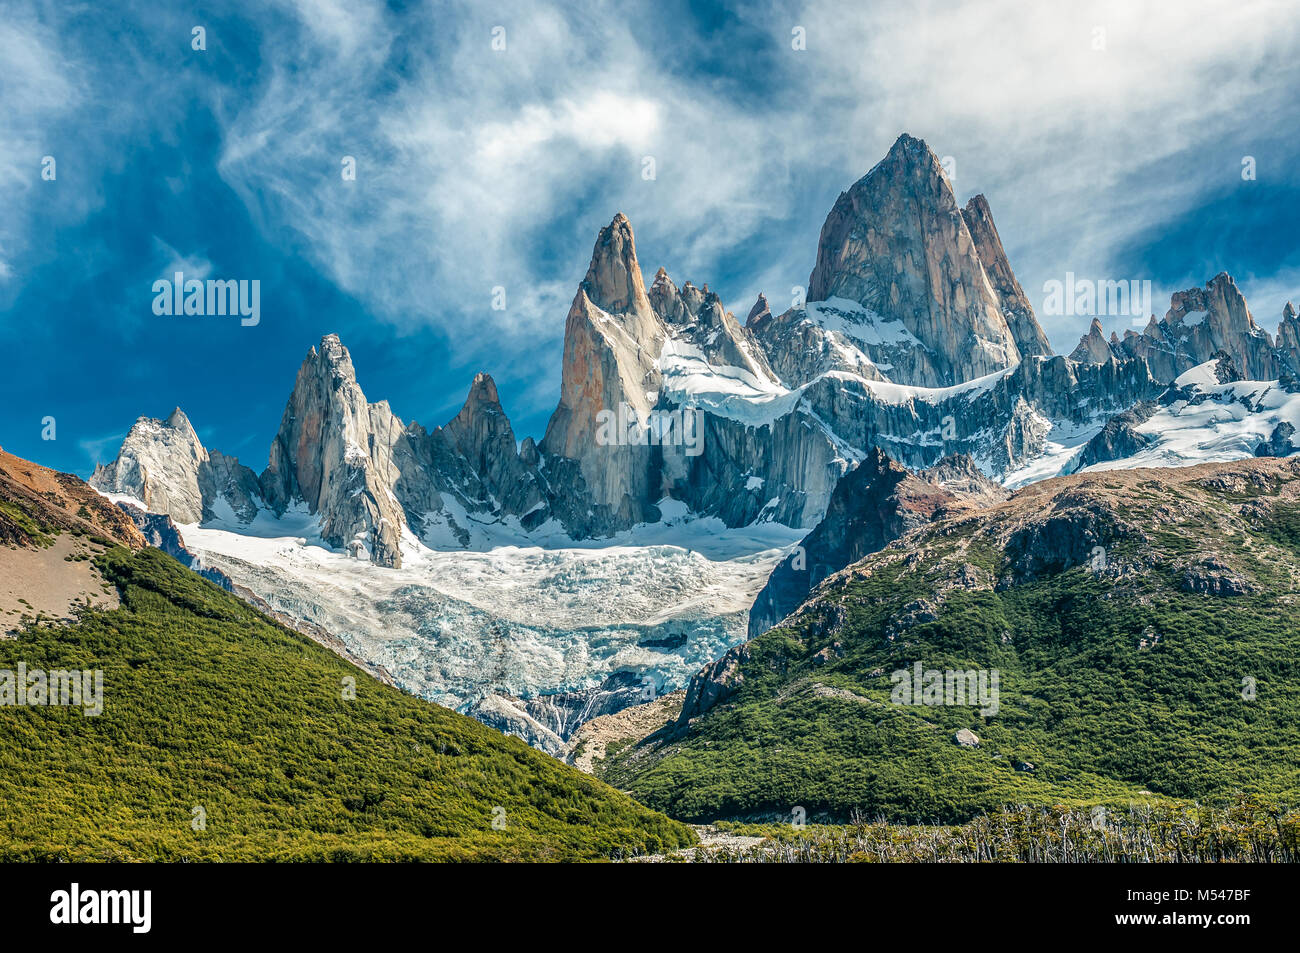 Fitz Roy Berg, El Chalten, Patagonien, Argentinien Stockfoto